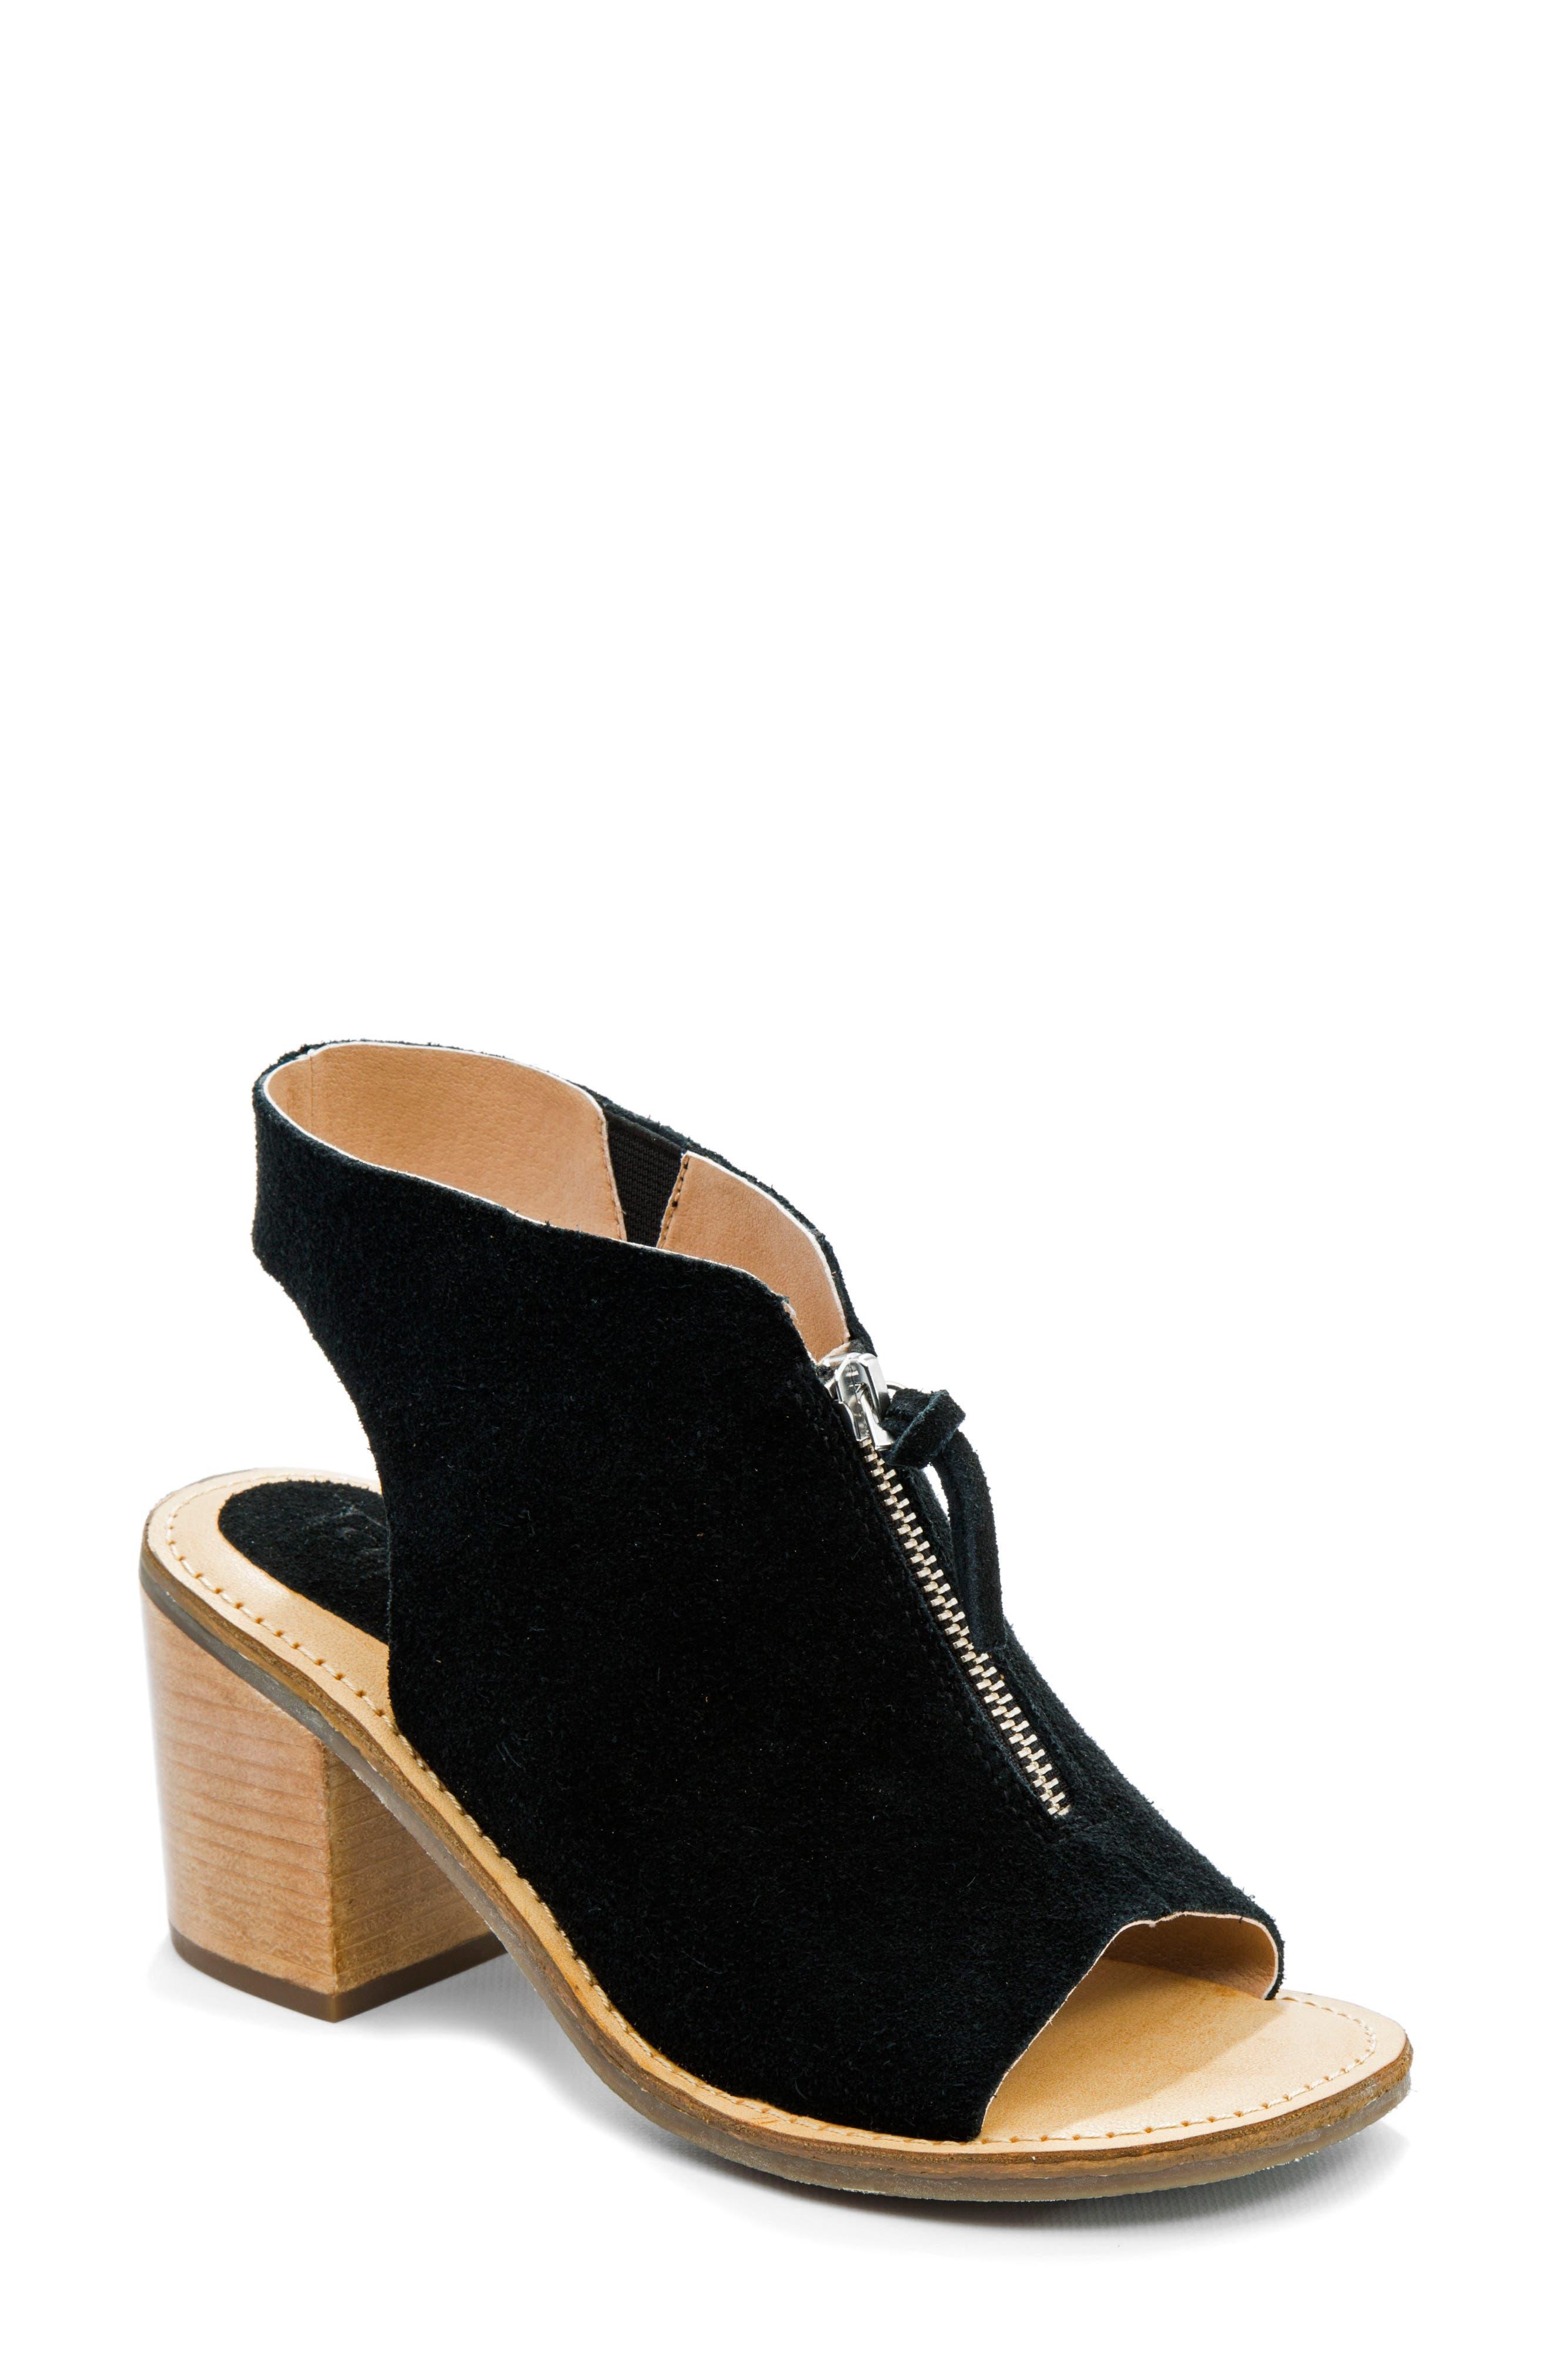 LATIGO Venice Sandal